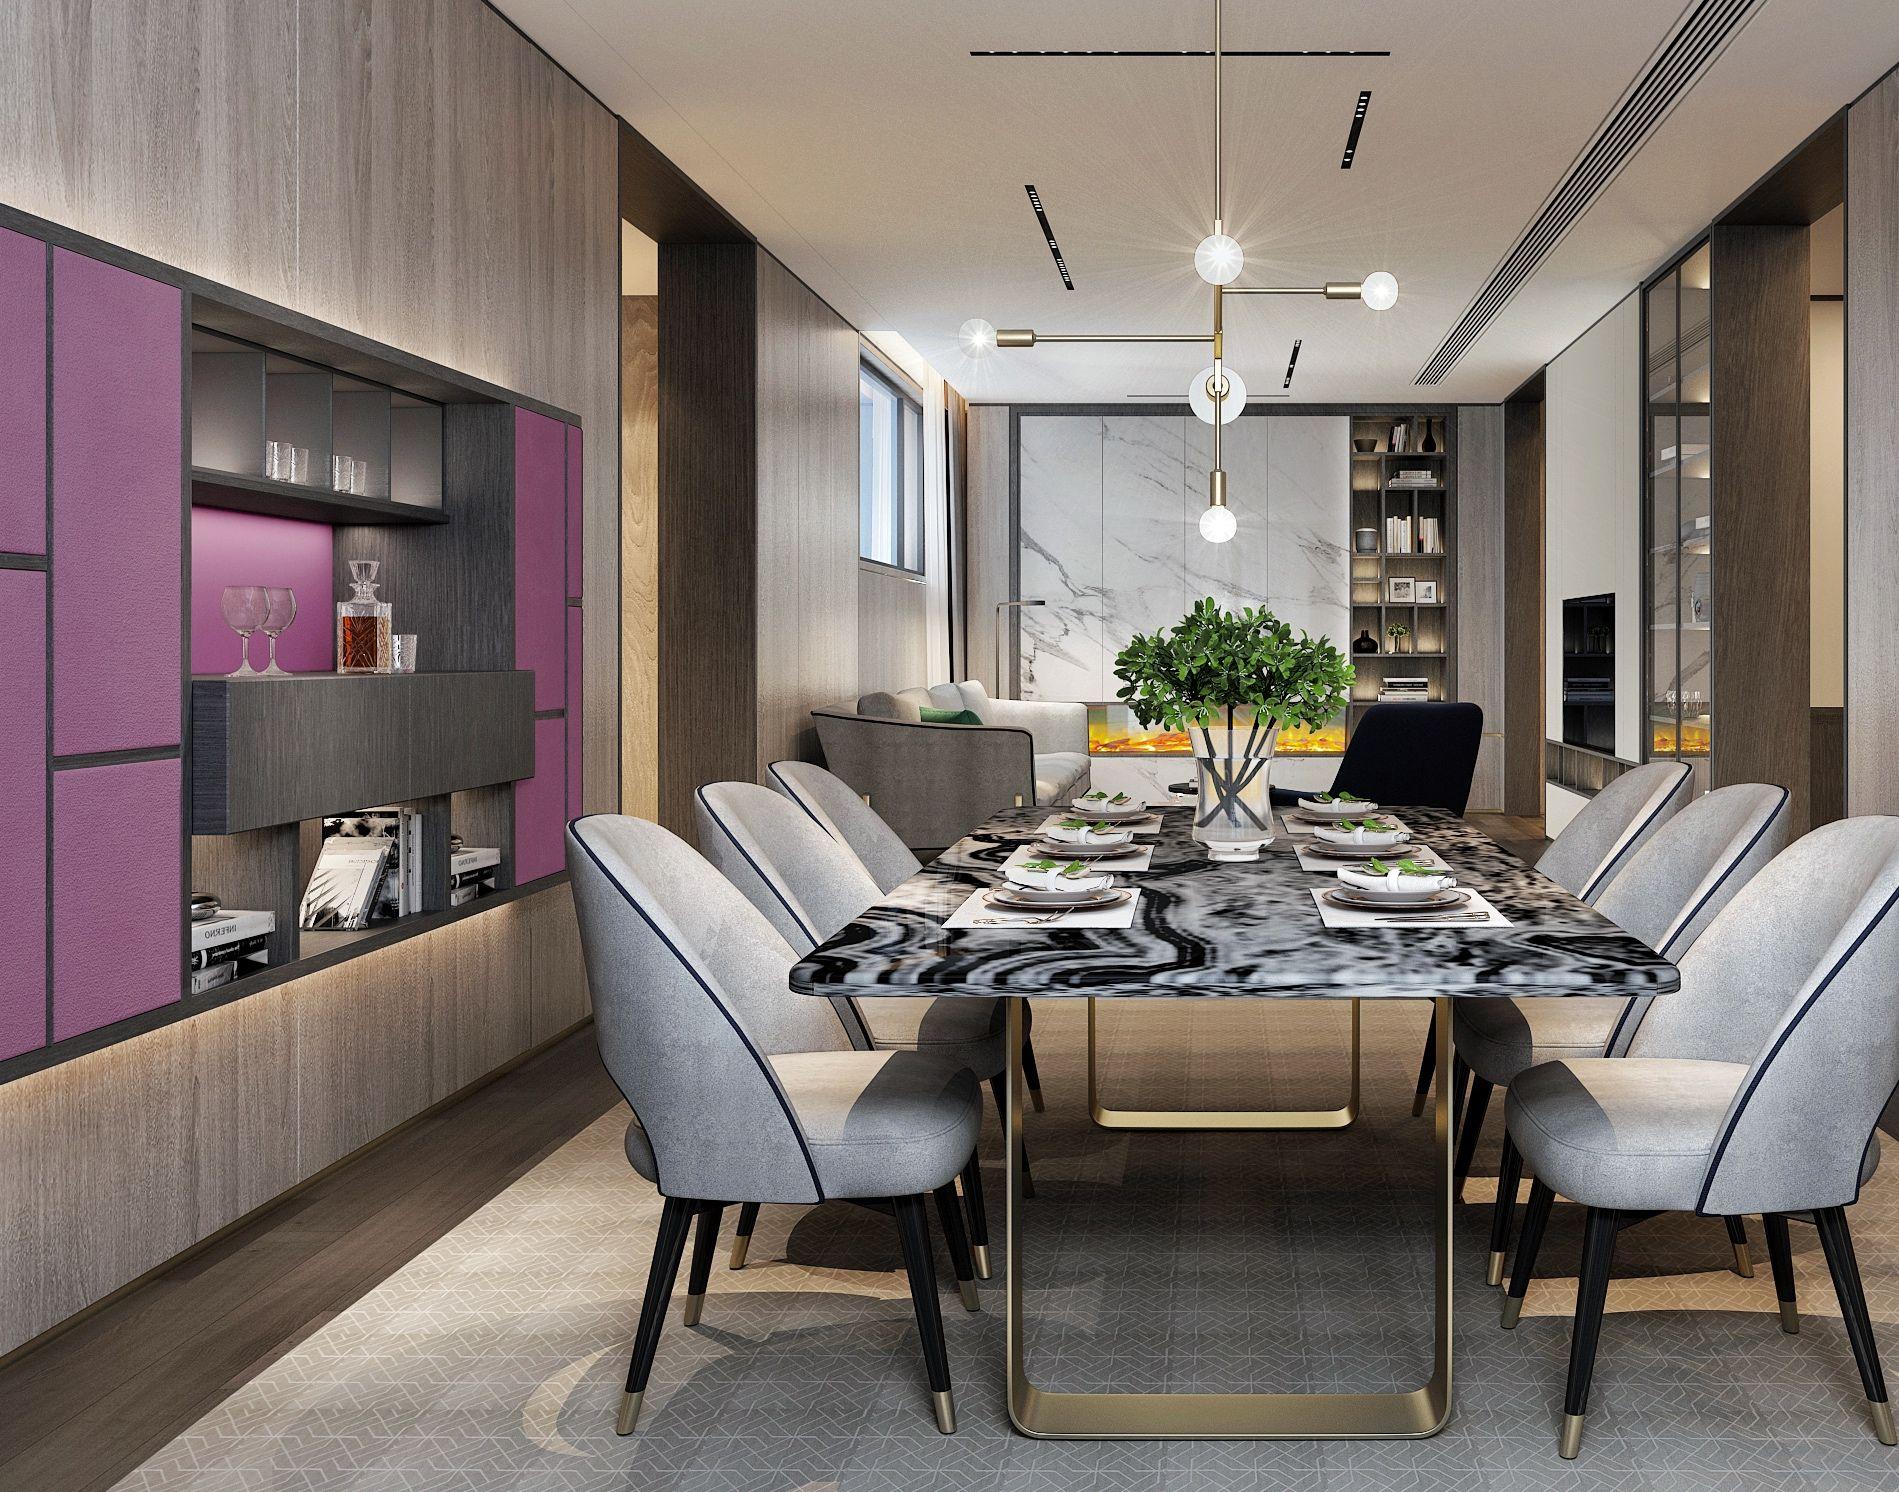 Pin By Suyili On Diningroom Dining Room Design Luxury Luxury Dining Room Dining Room Design Modern